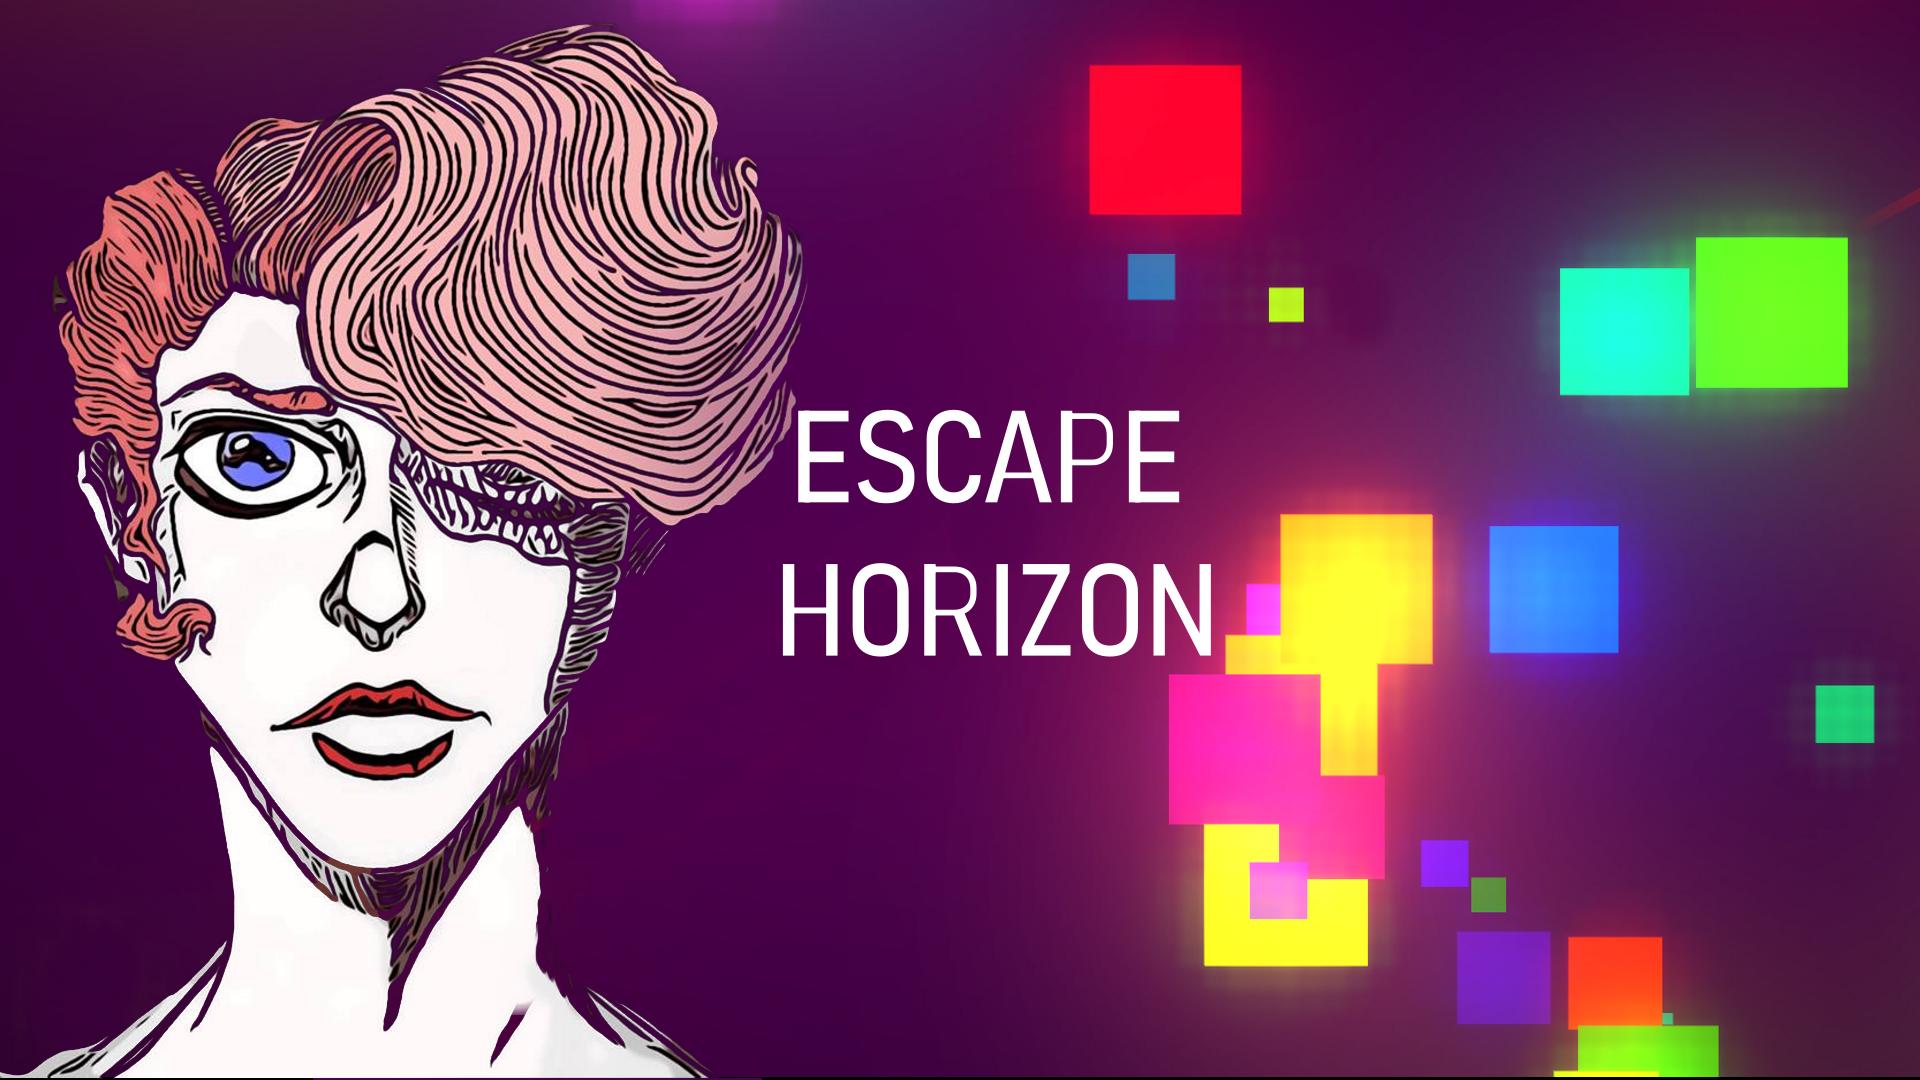 Escape Horizon